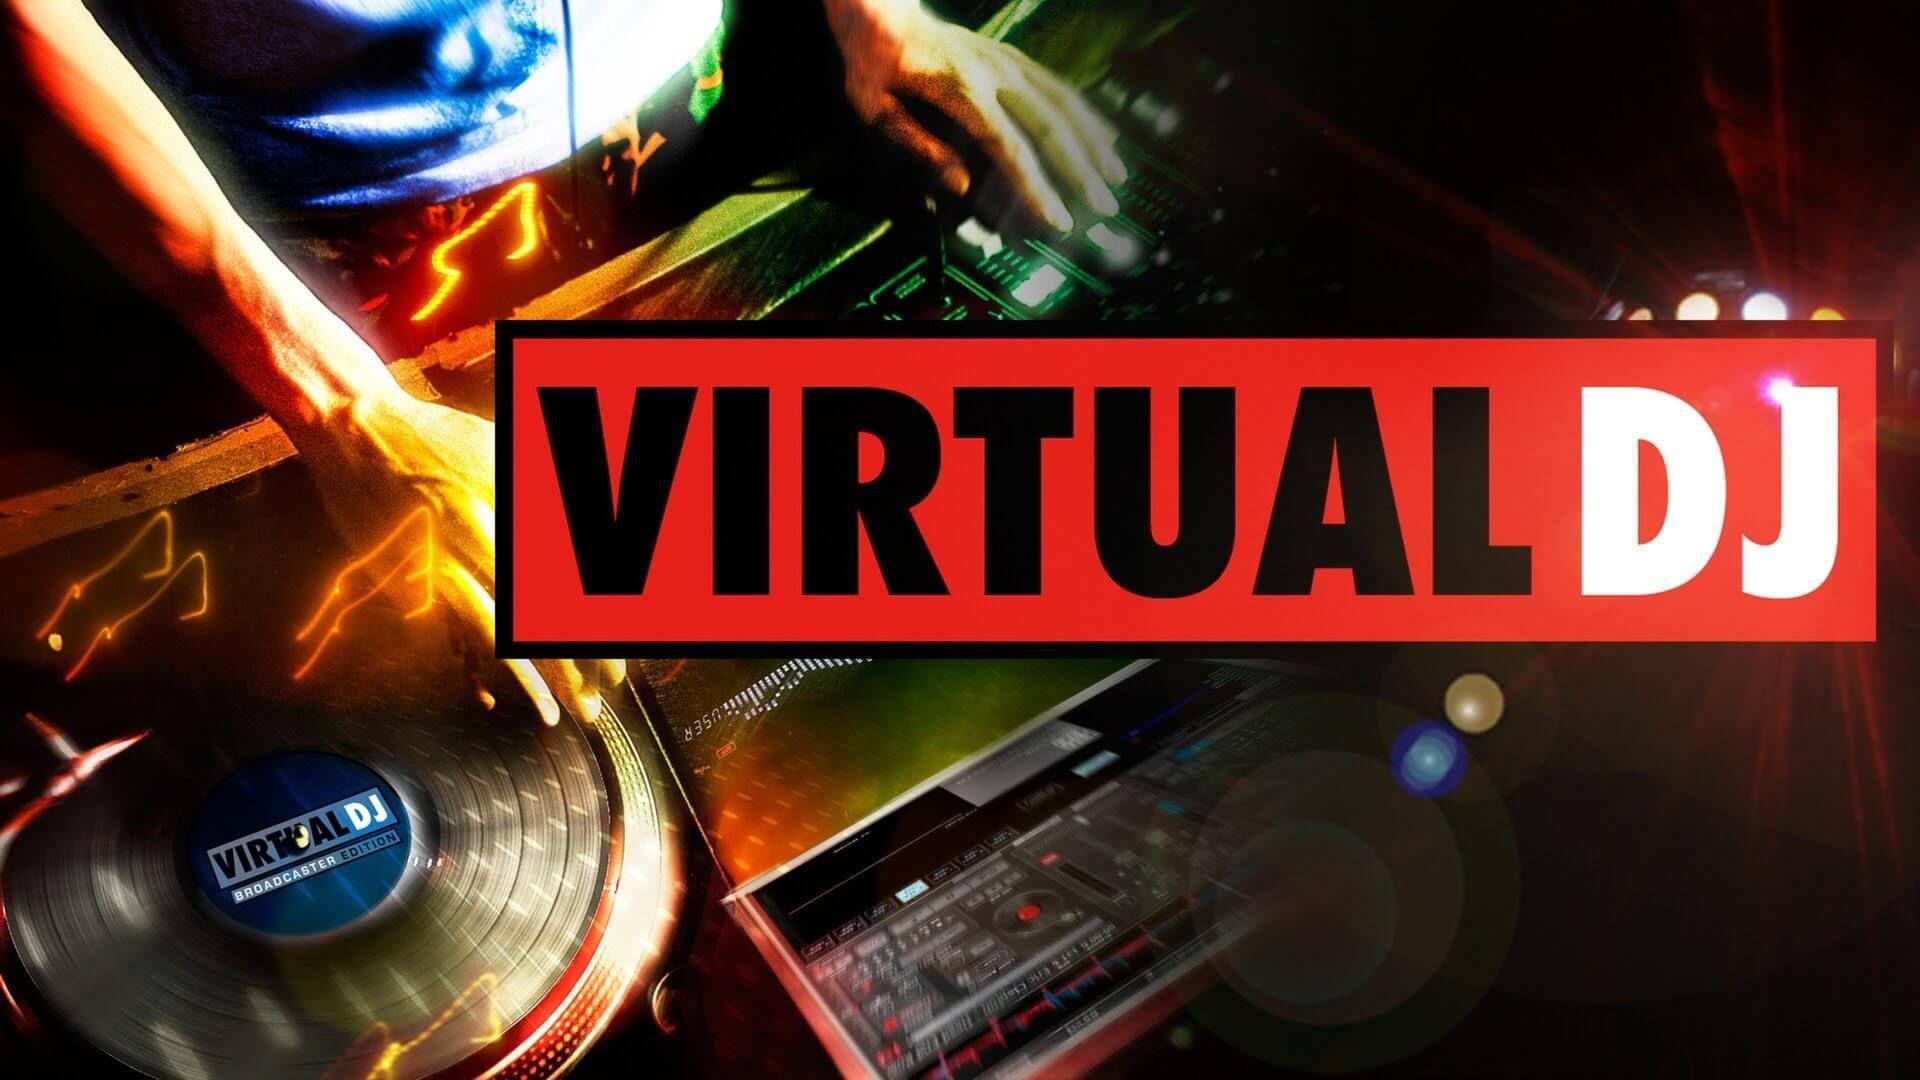 virtual dj number